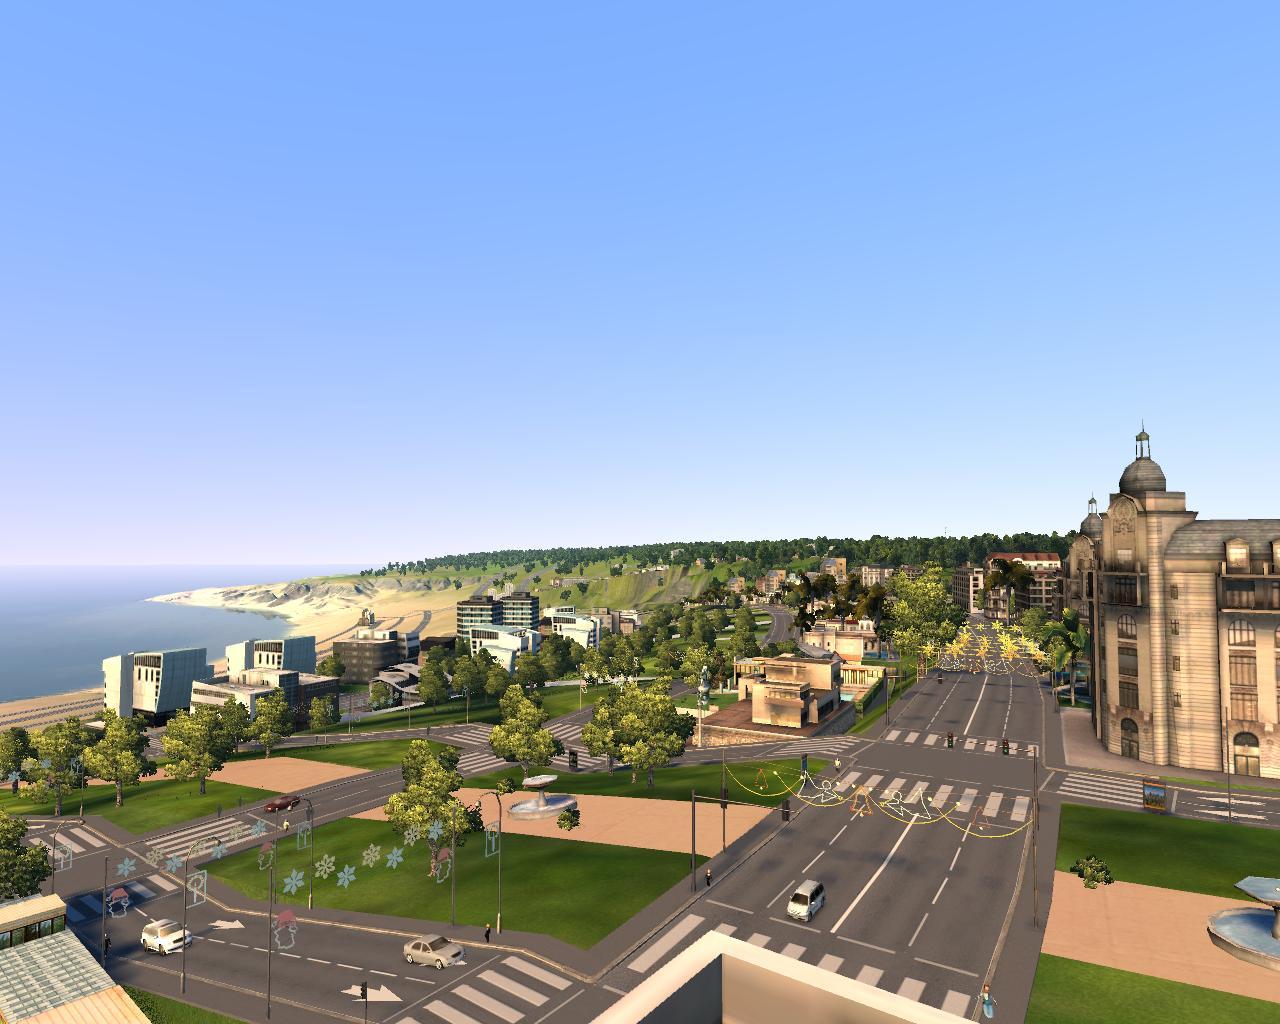 Cities XL Coast